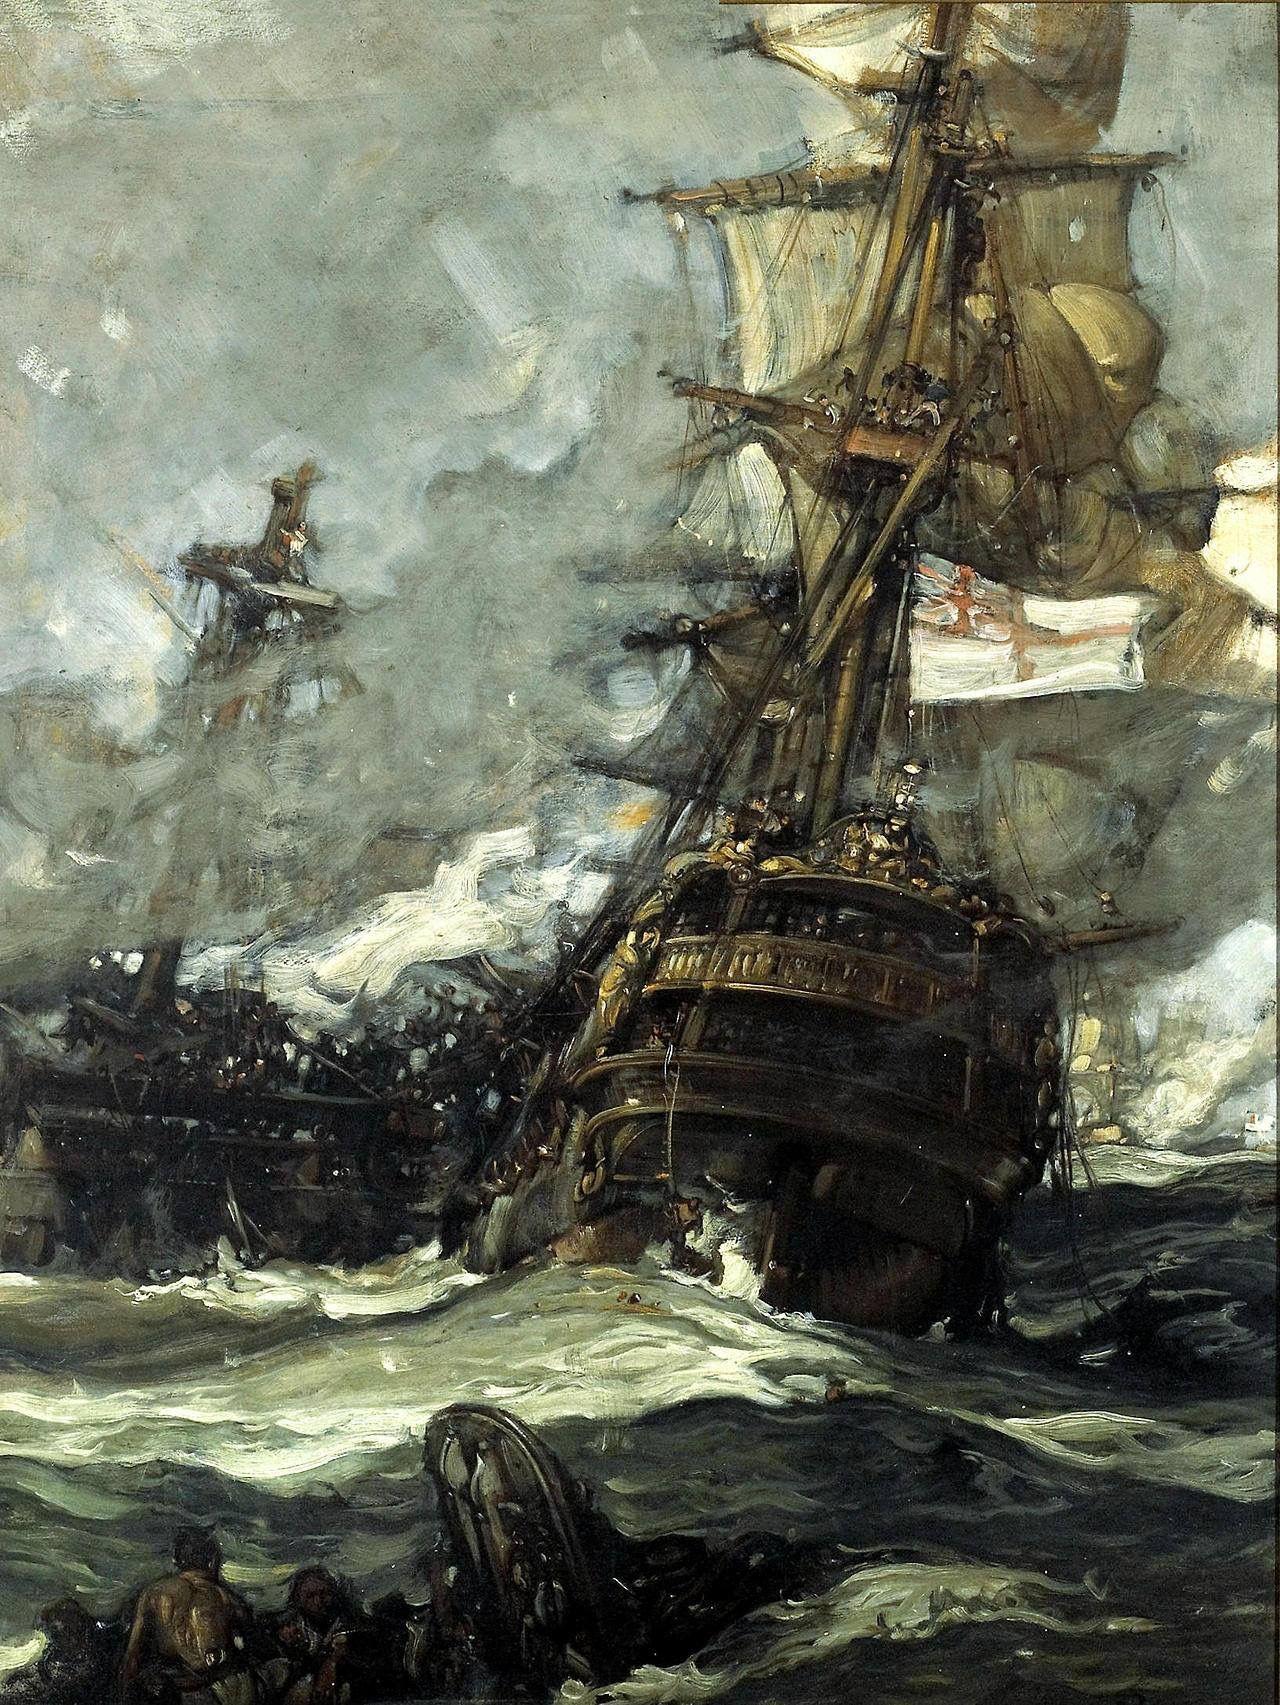 Pin de Stan Willett en Sailing Ships | Pinterest | Piratas, Veleros ...